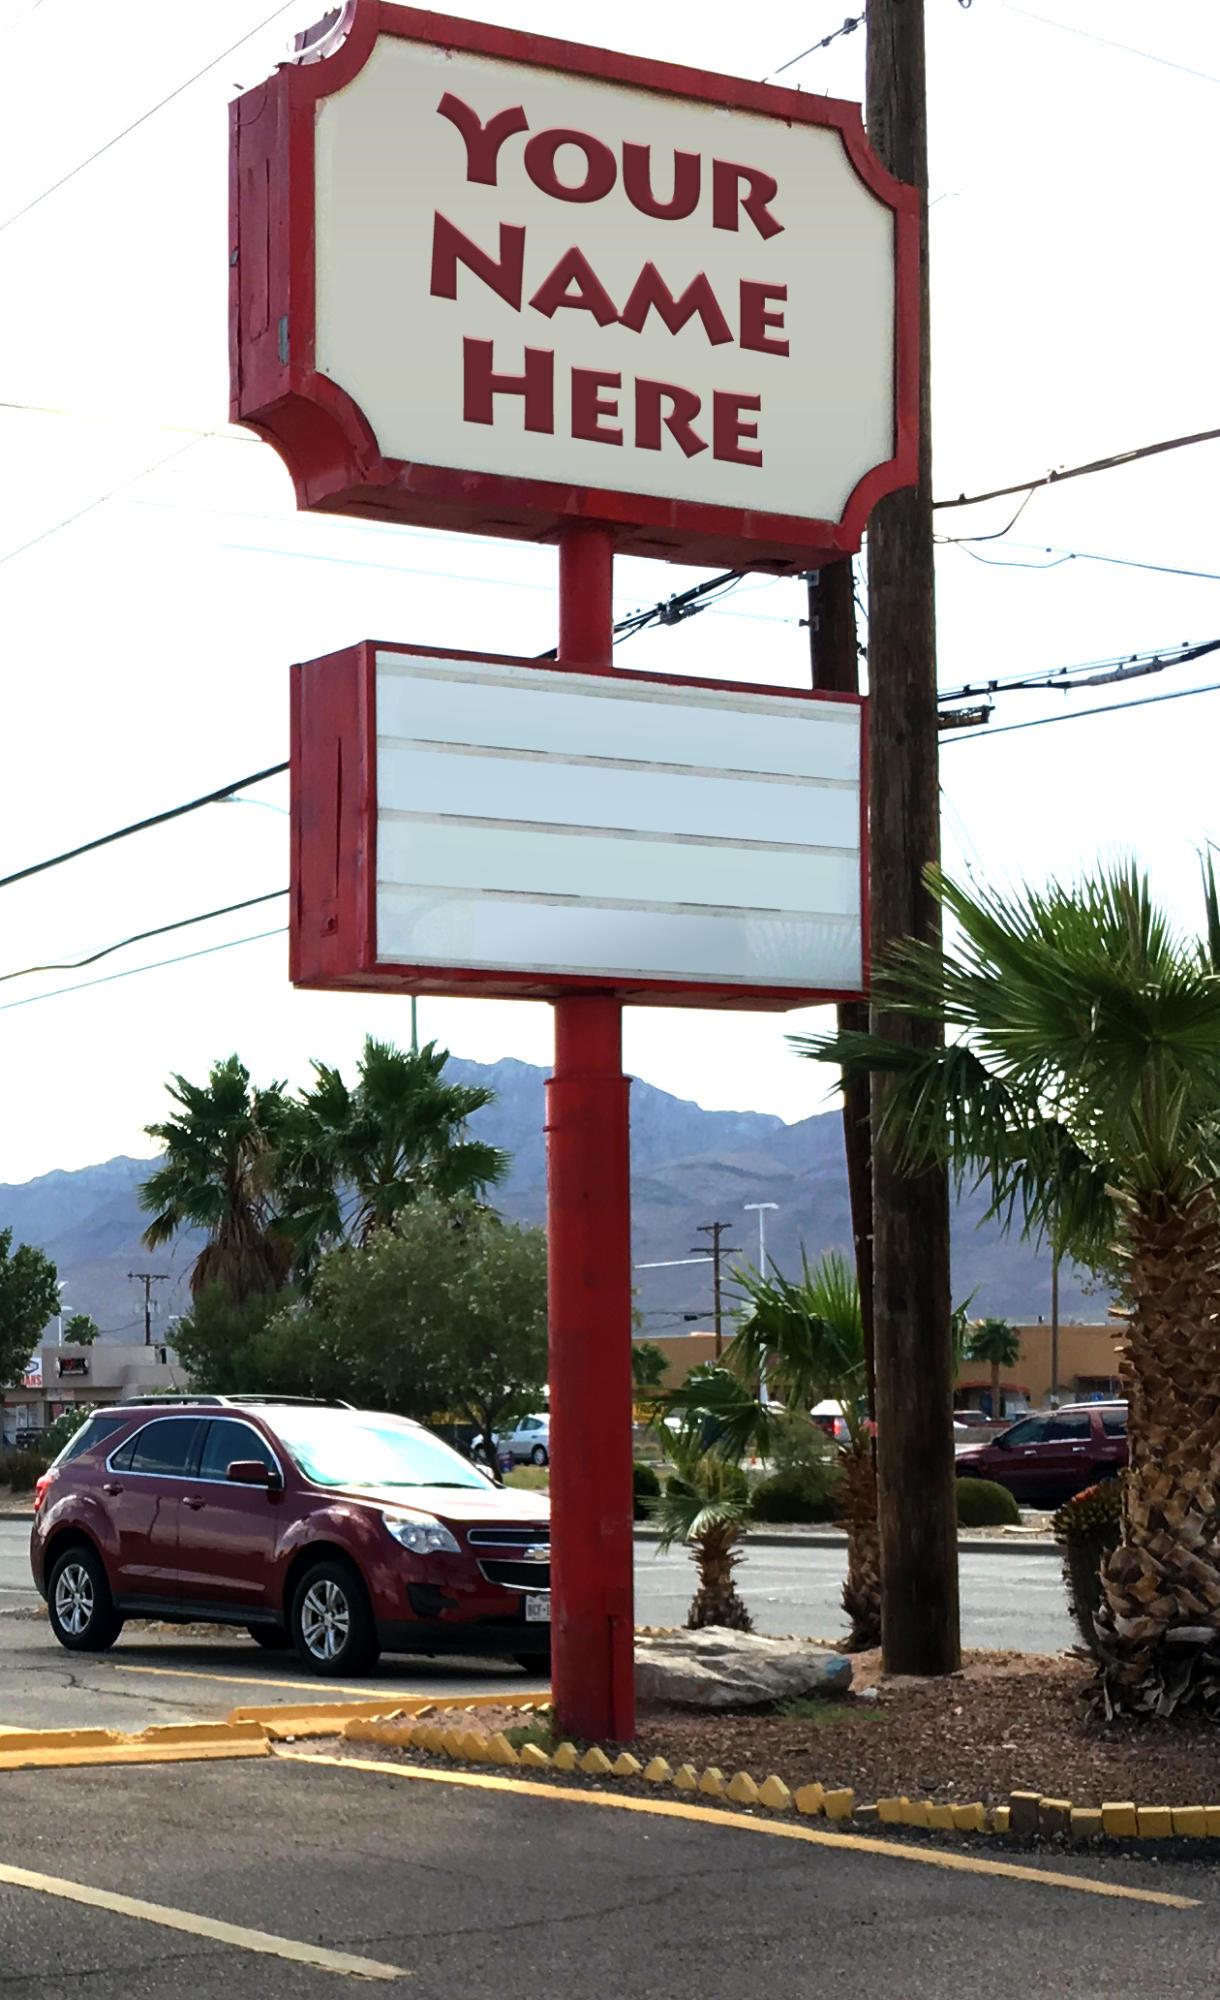 9868 Dyer, El Paso, Texas 79924, ,Commercial,For sale,Dyer,828795